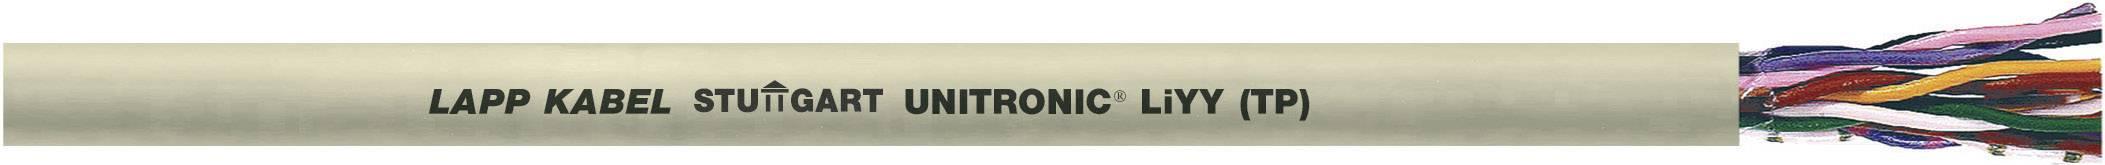 Datový kabel Unitronic LIYY TP 3x2x0,5